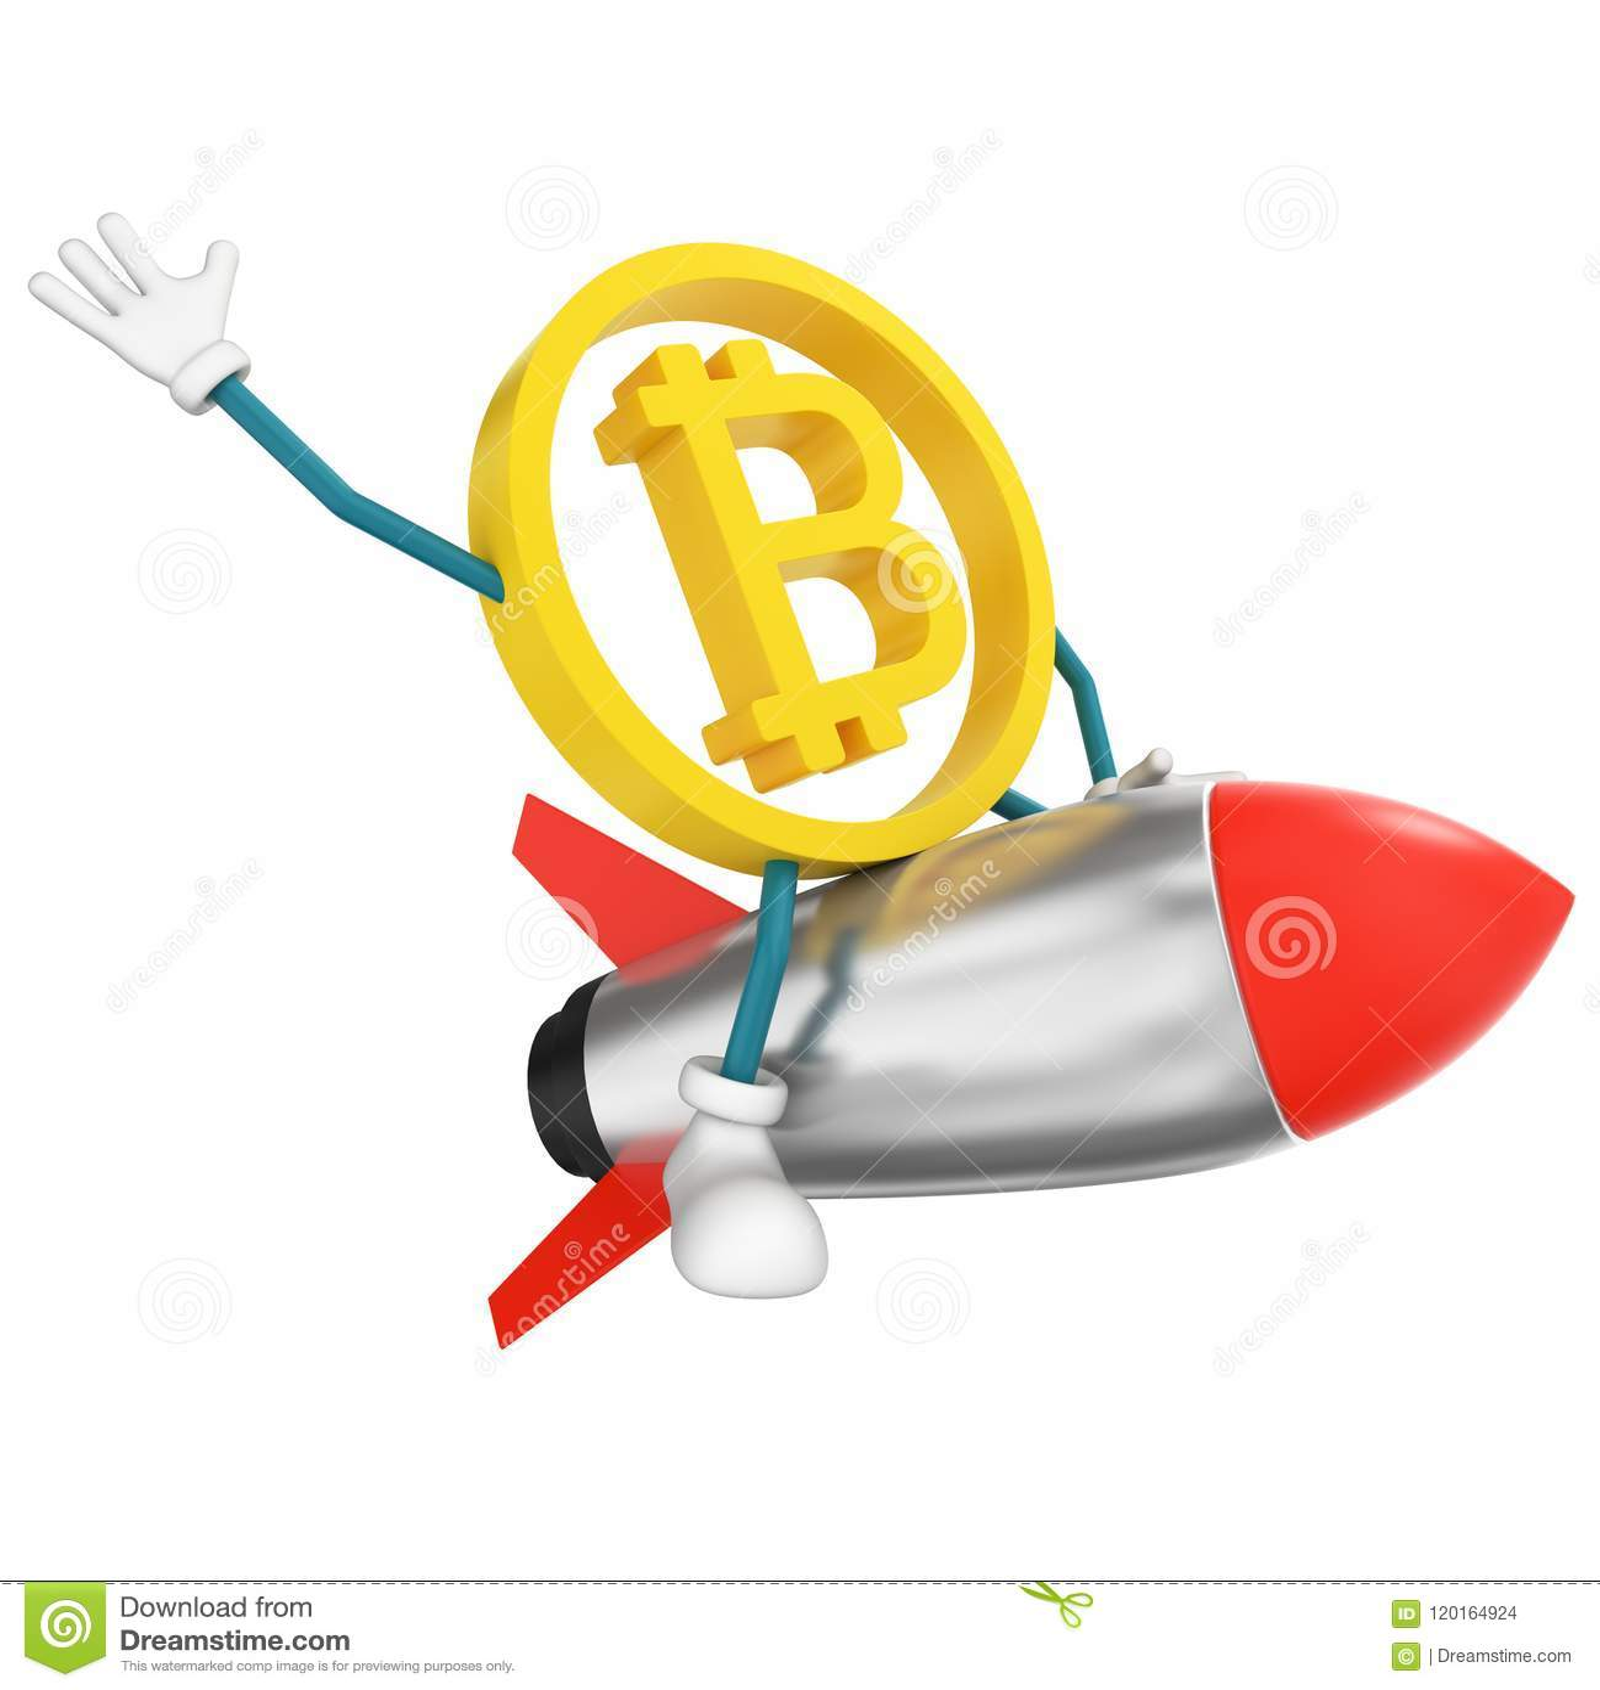 Bitcoin character flying on rocket